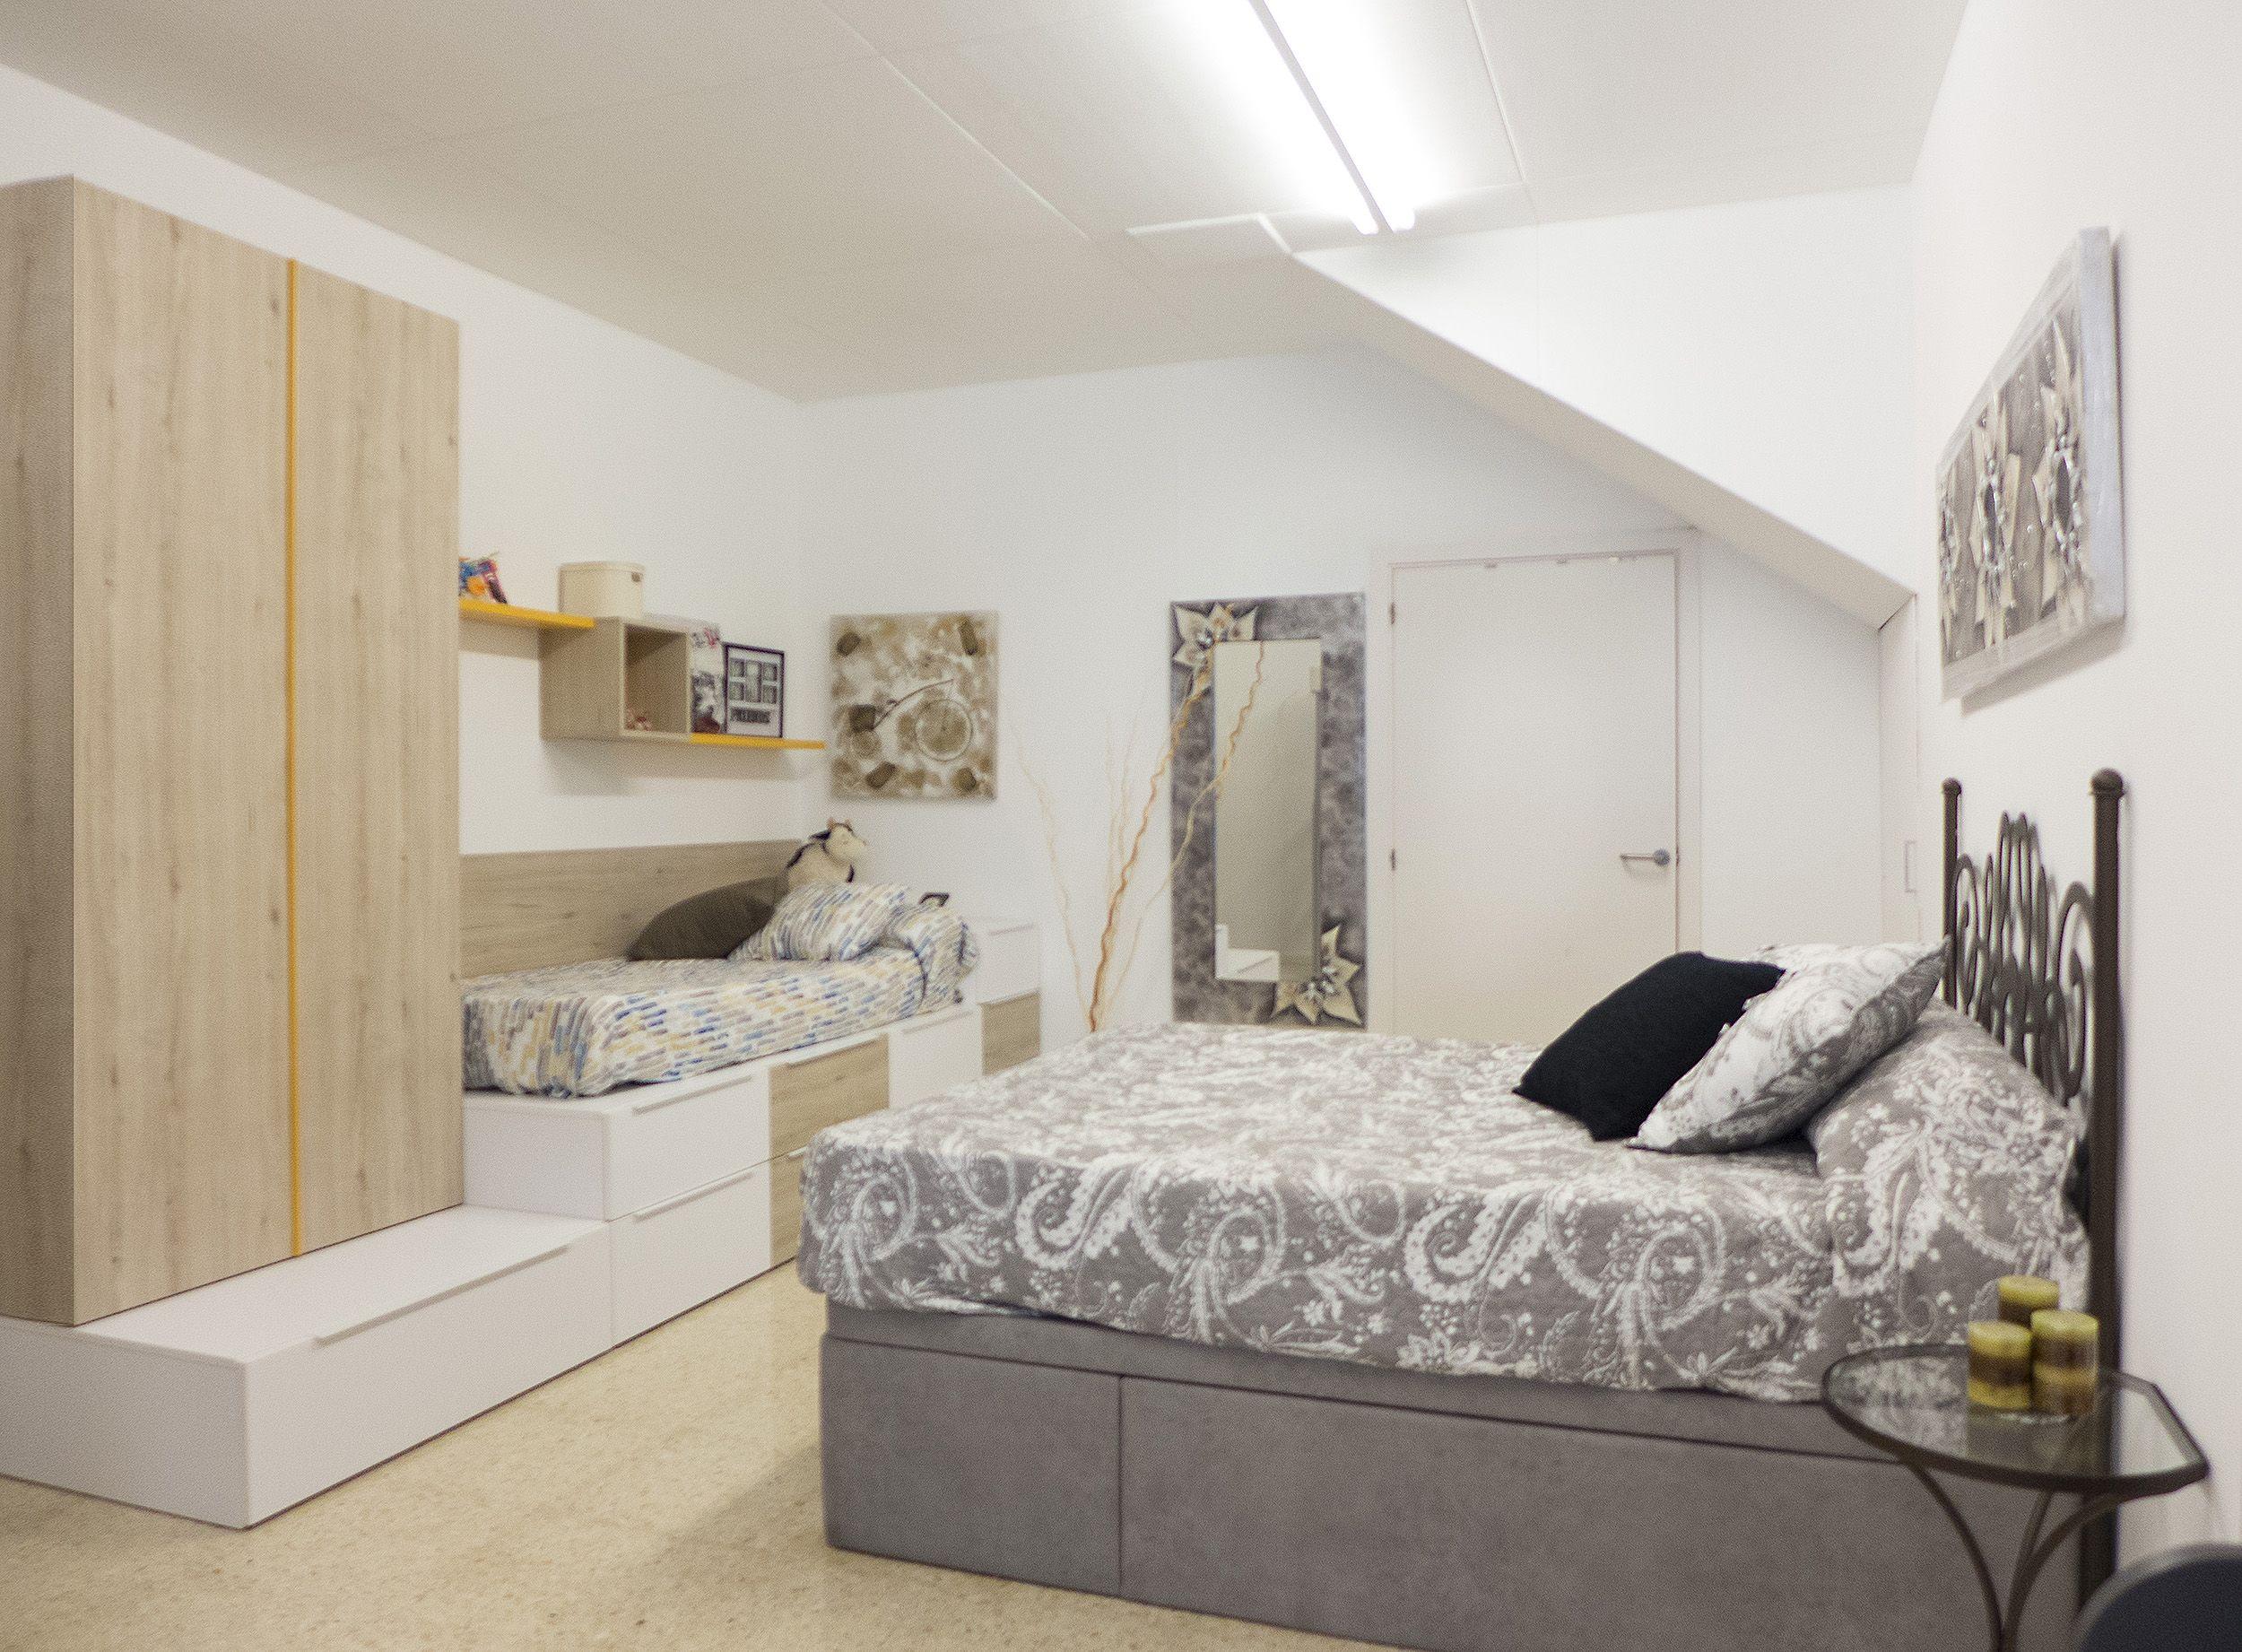 Dormitorios a medida en Sarriá San Gervasi